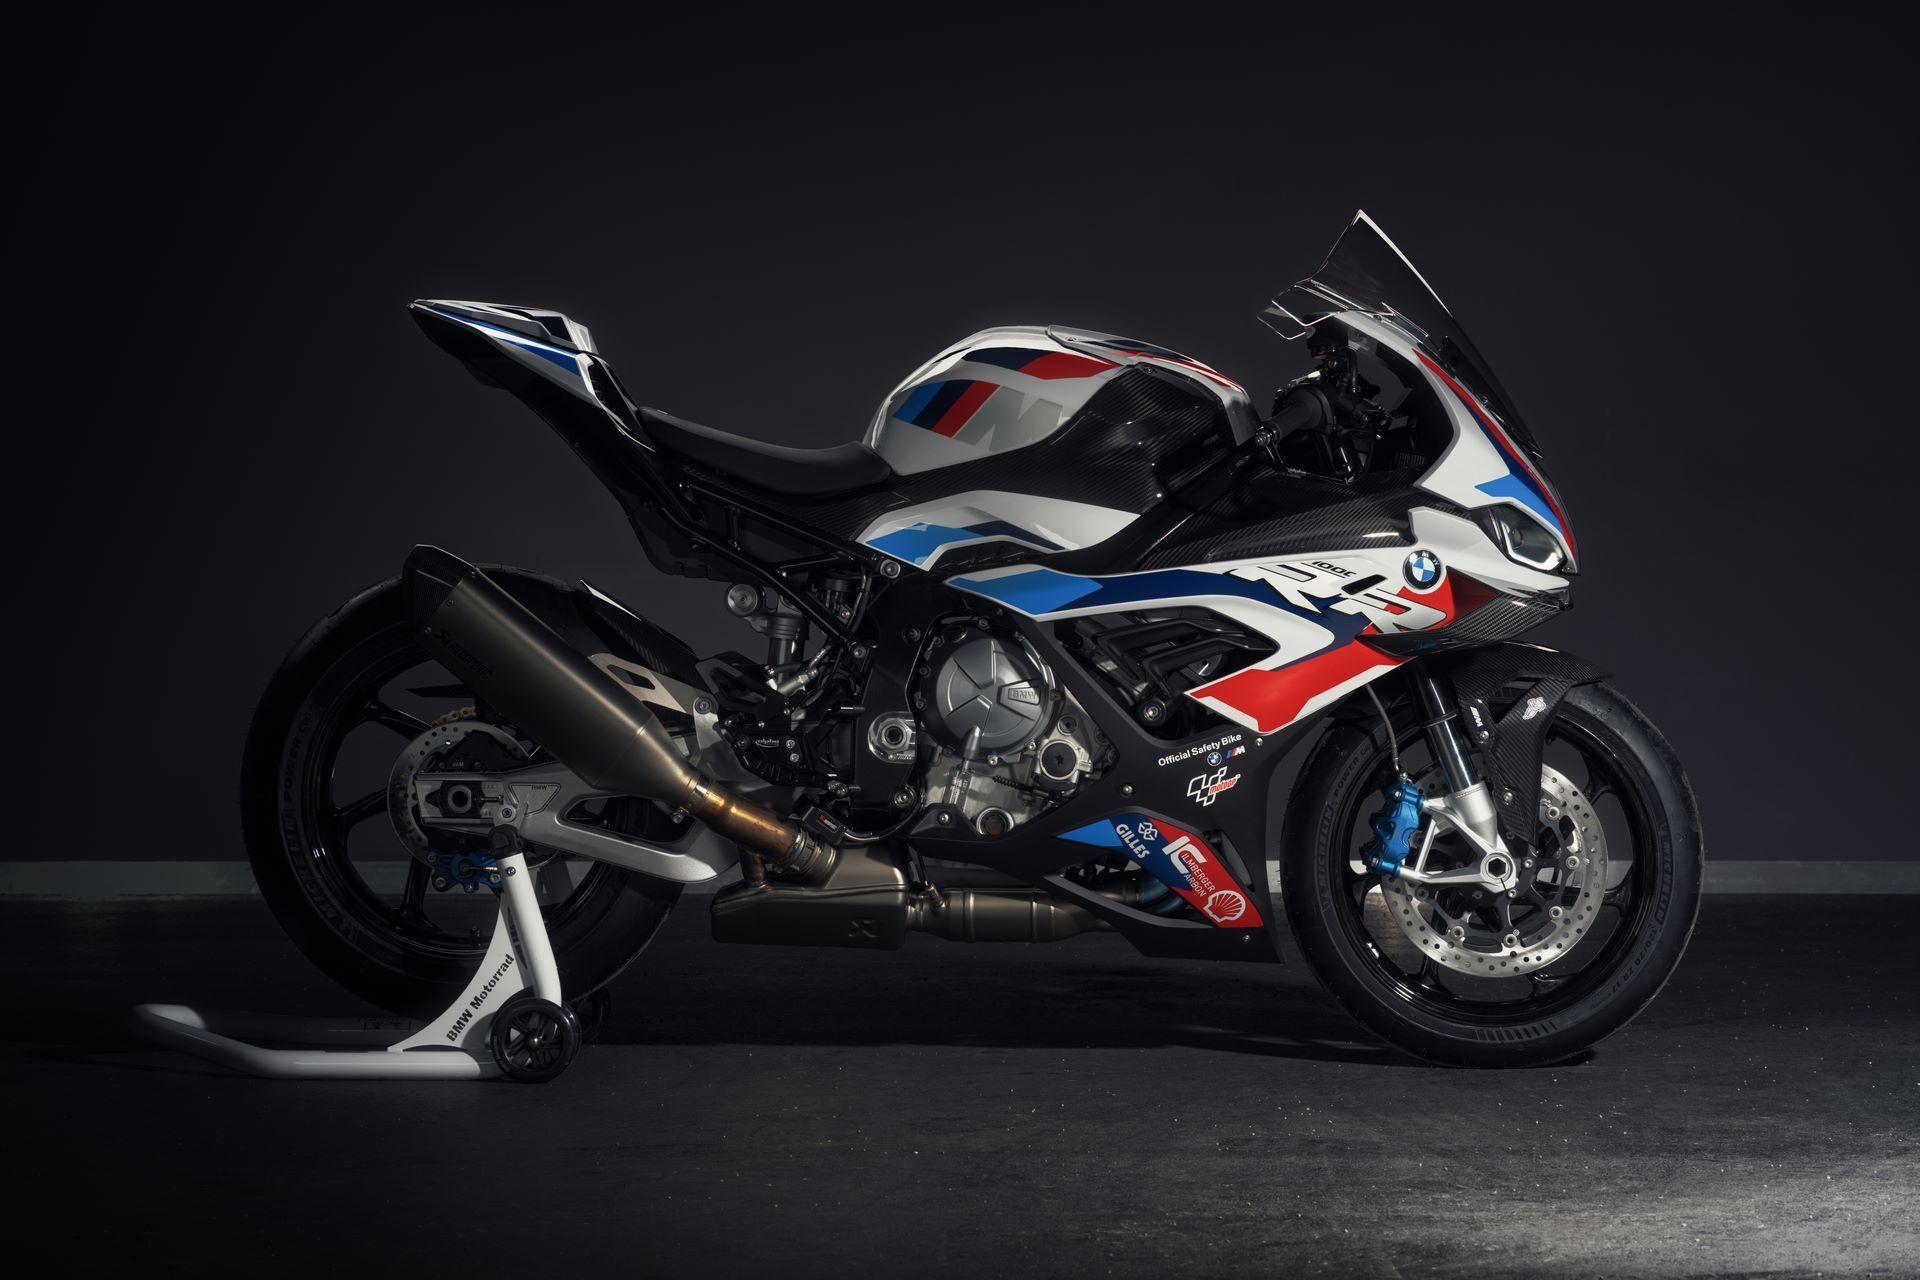 BMW-M-1000-RR-safety-bike-moto-gp-motogp-17